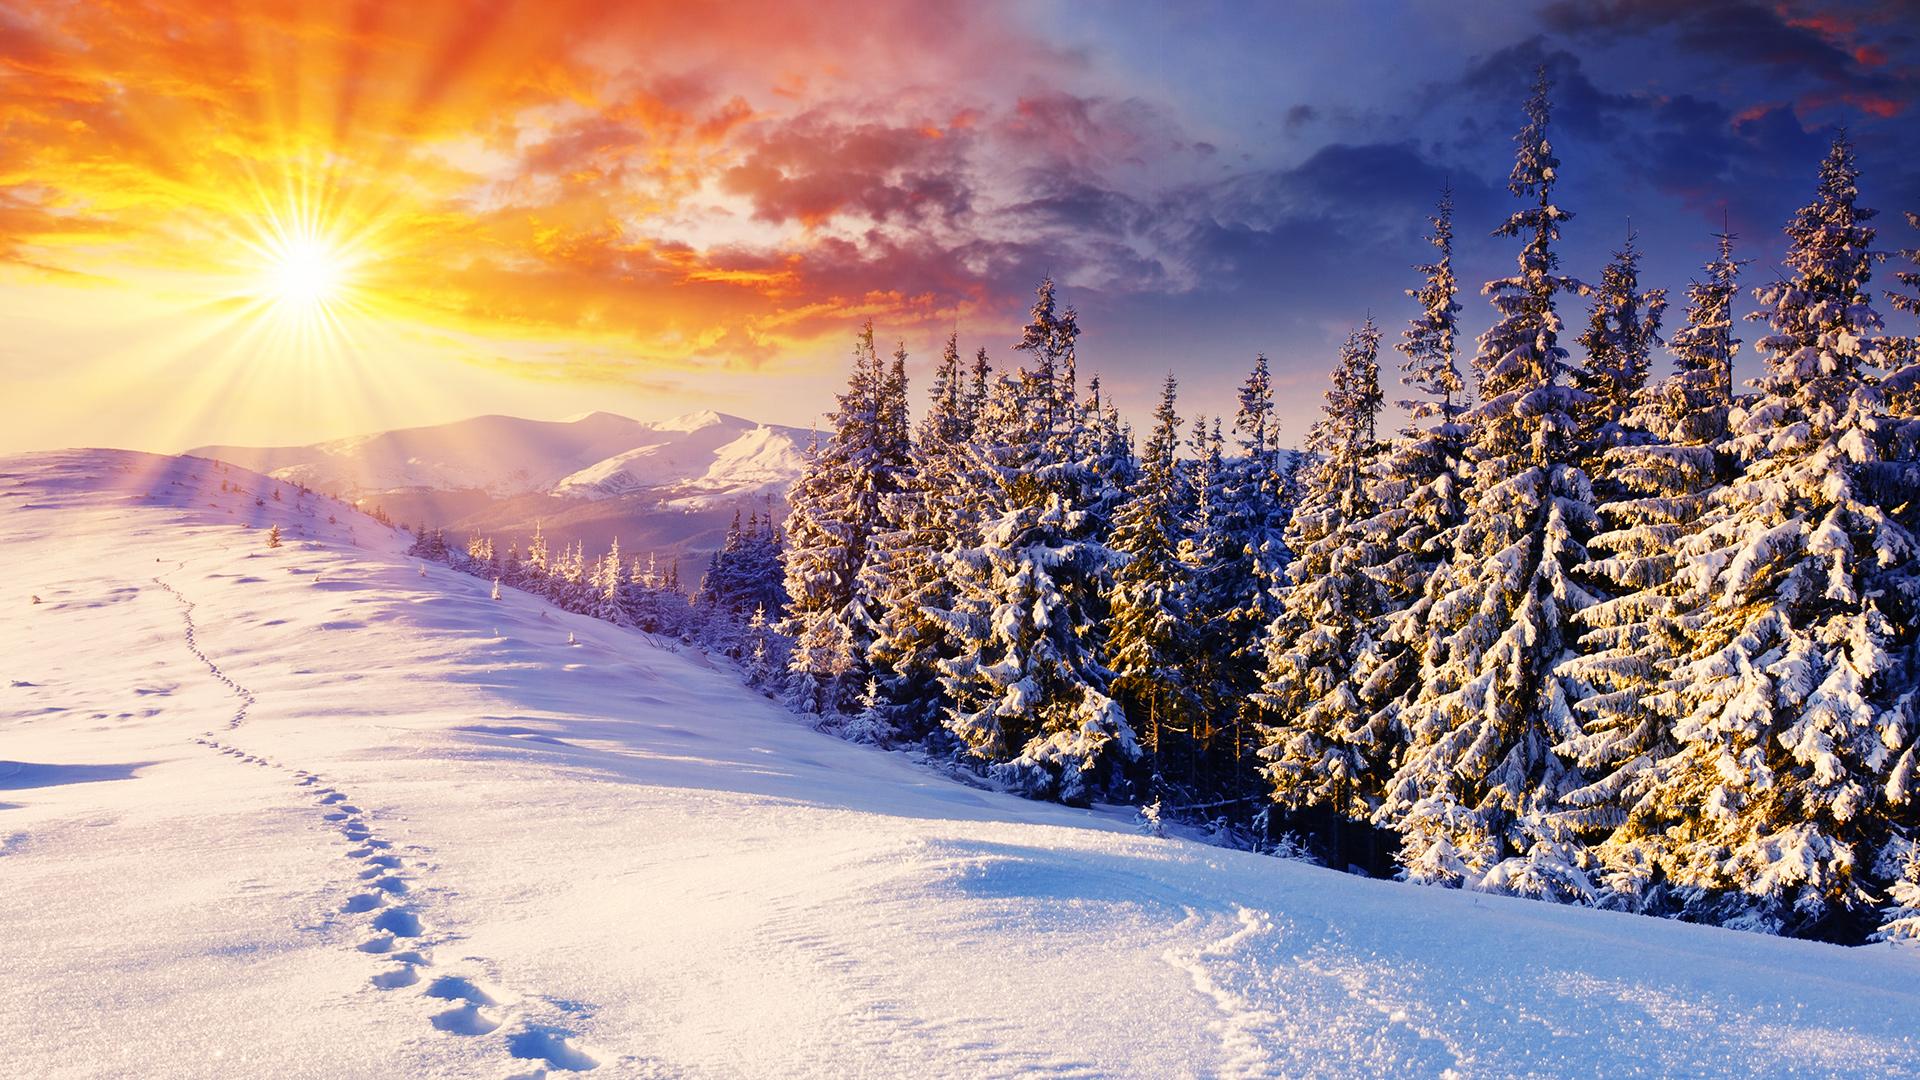 Winter Backgrounds wallpaper | 1920x1080 | #51262